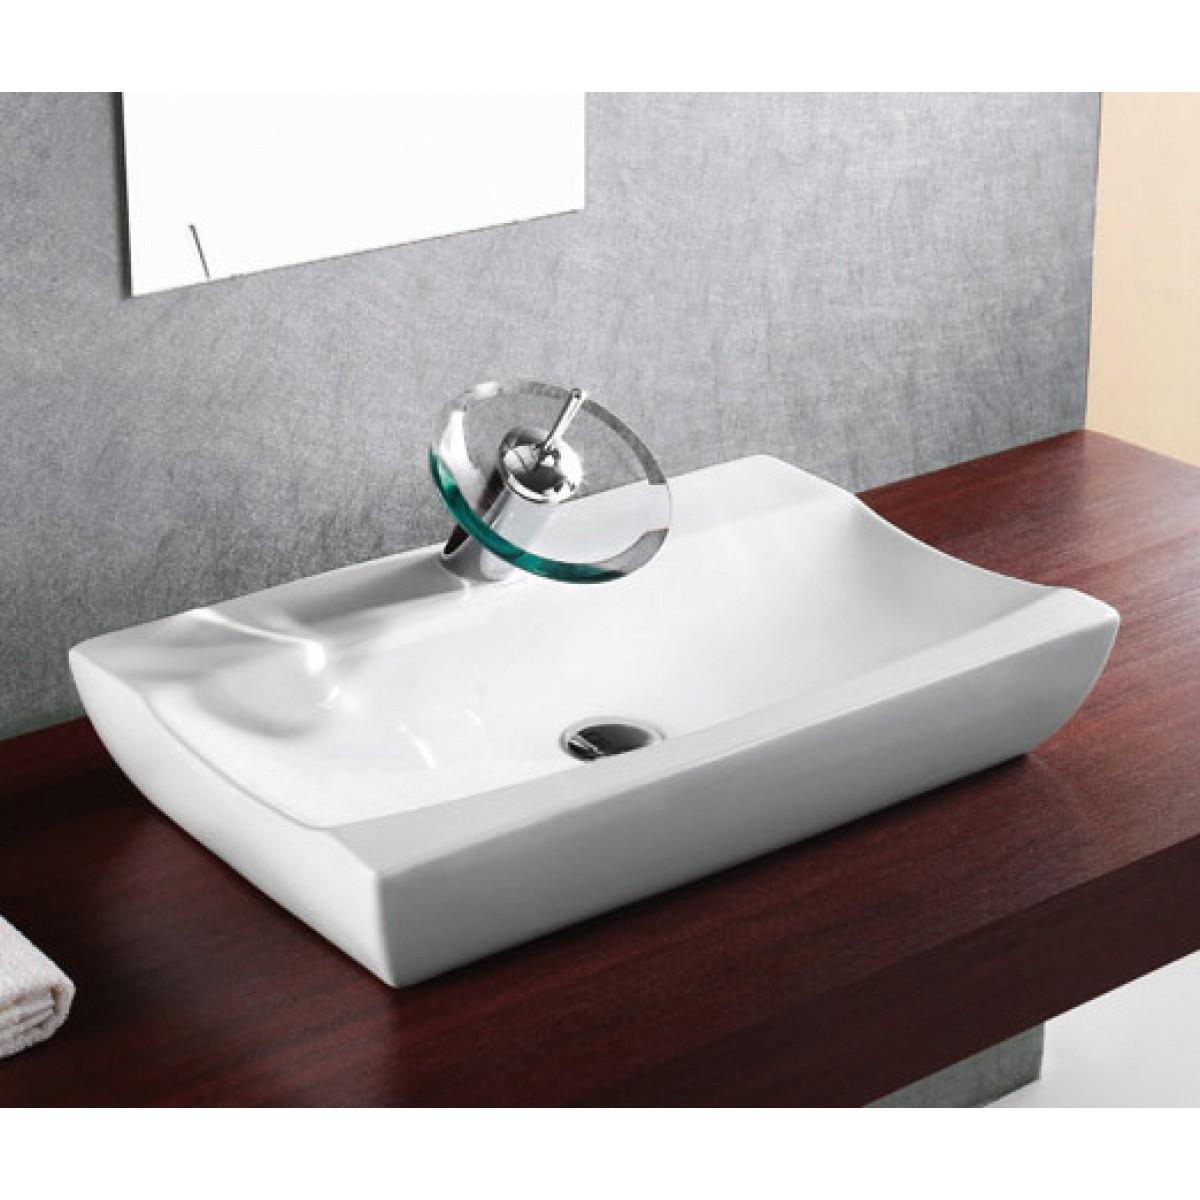 Porcelain Ceramic Single Hole Countertop Bathroom Vessel Sink 25 X 15 1 2 X 5 1 2 Inch